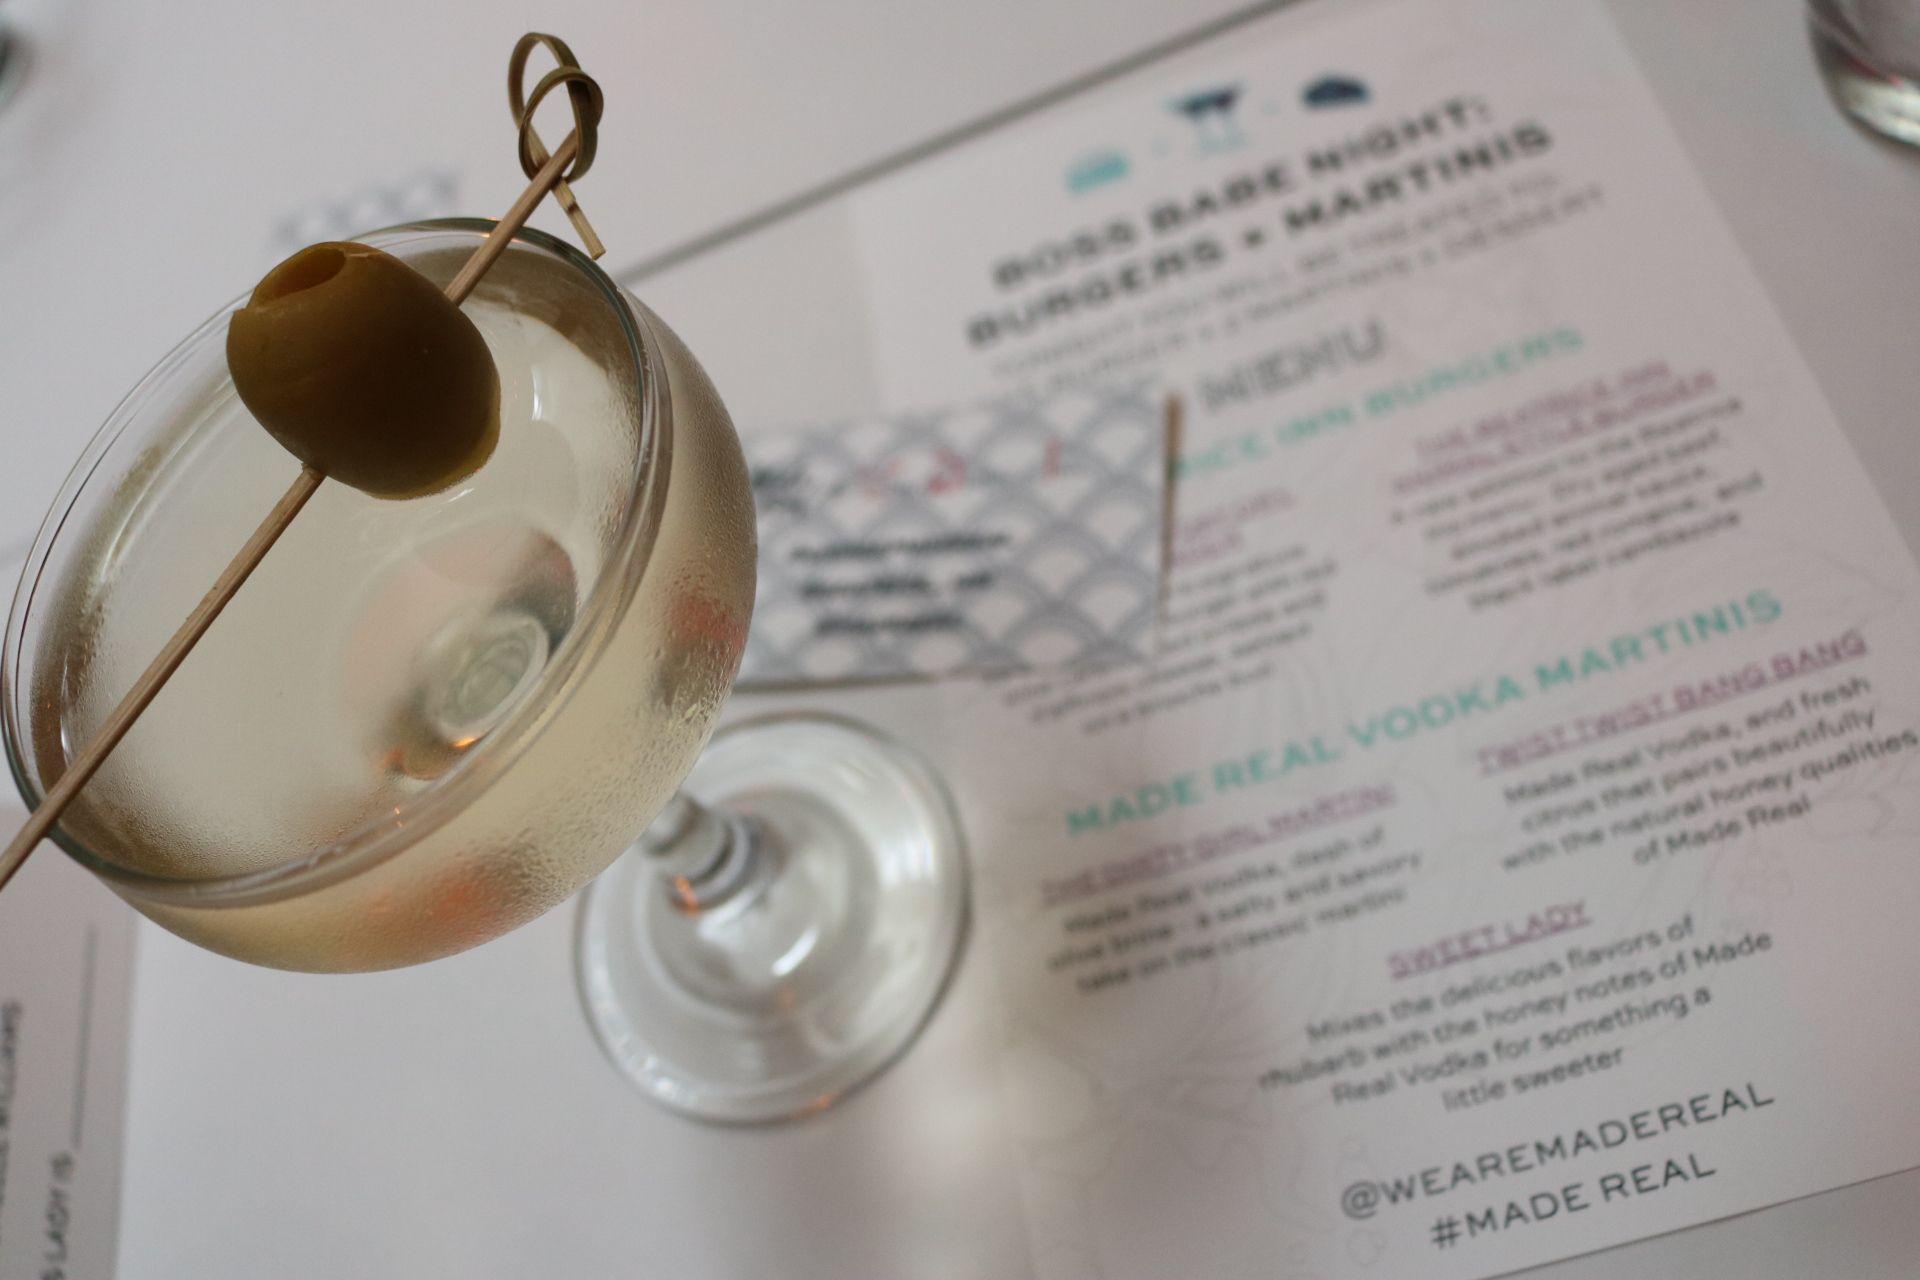 The Dirty Girl Martini